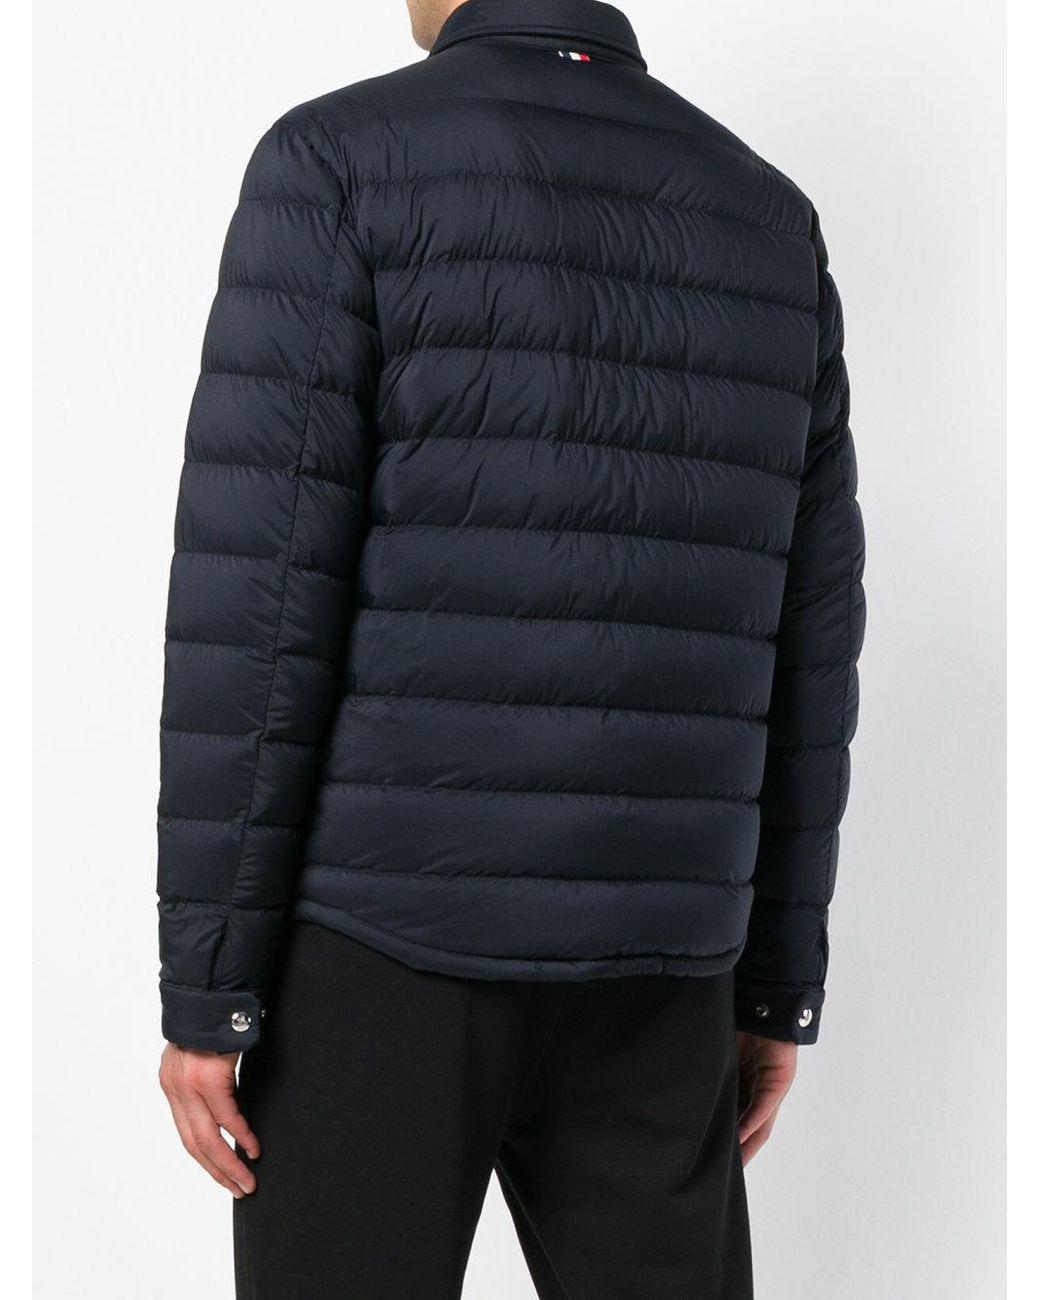 8bdac72c4 Moncler Caph Giubbotto Jacket in Blue for Men - Save 13% - Lyst